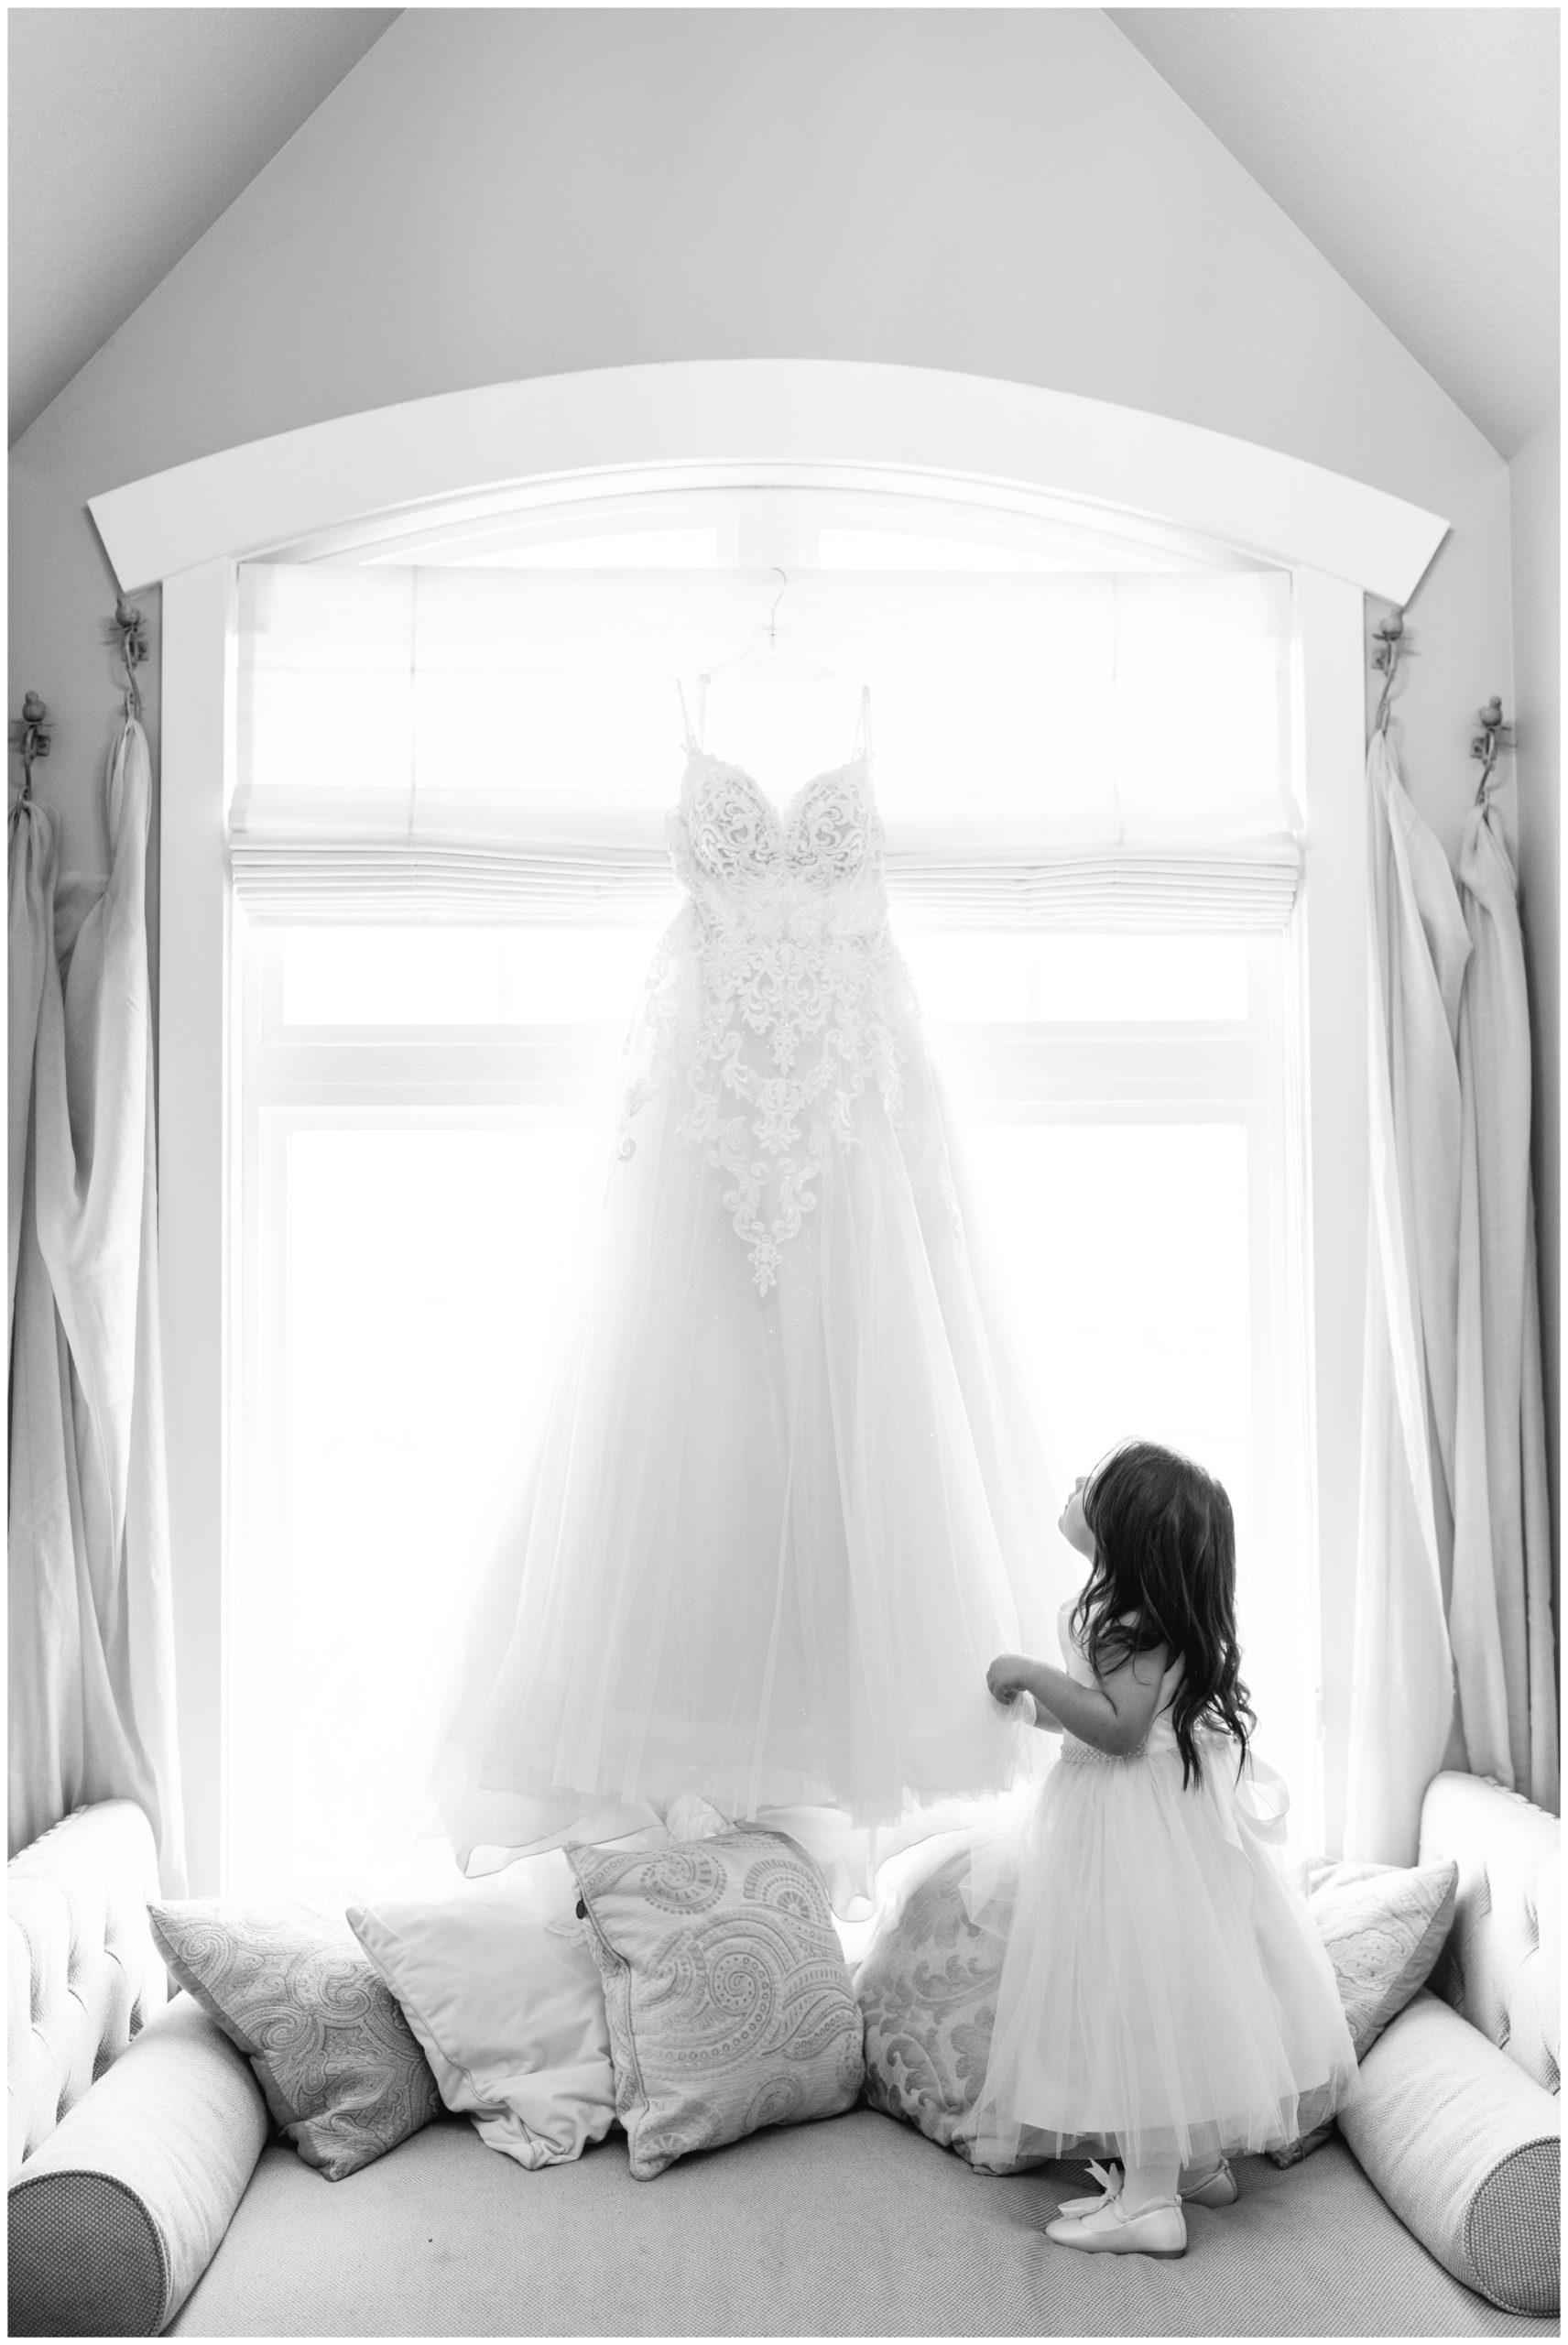 Young daughter looking at her mom's dress hanging in window at Sleepy Ridge in Vineyard Utah